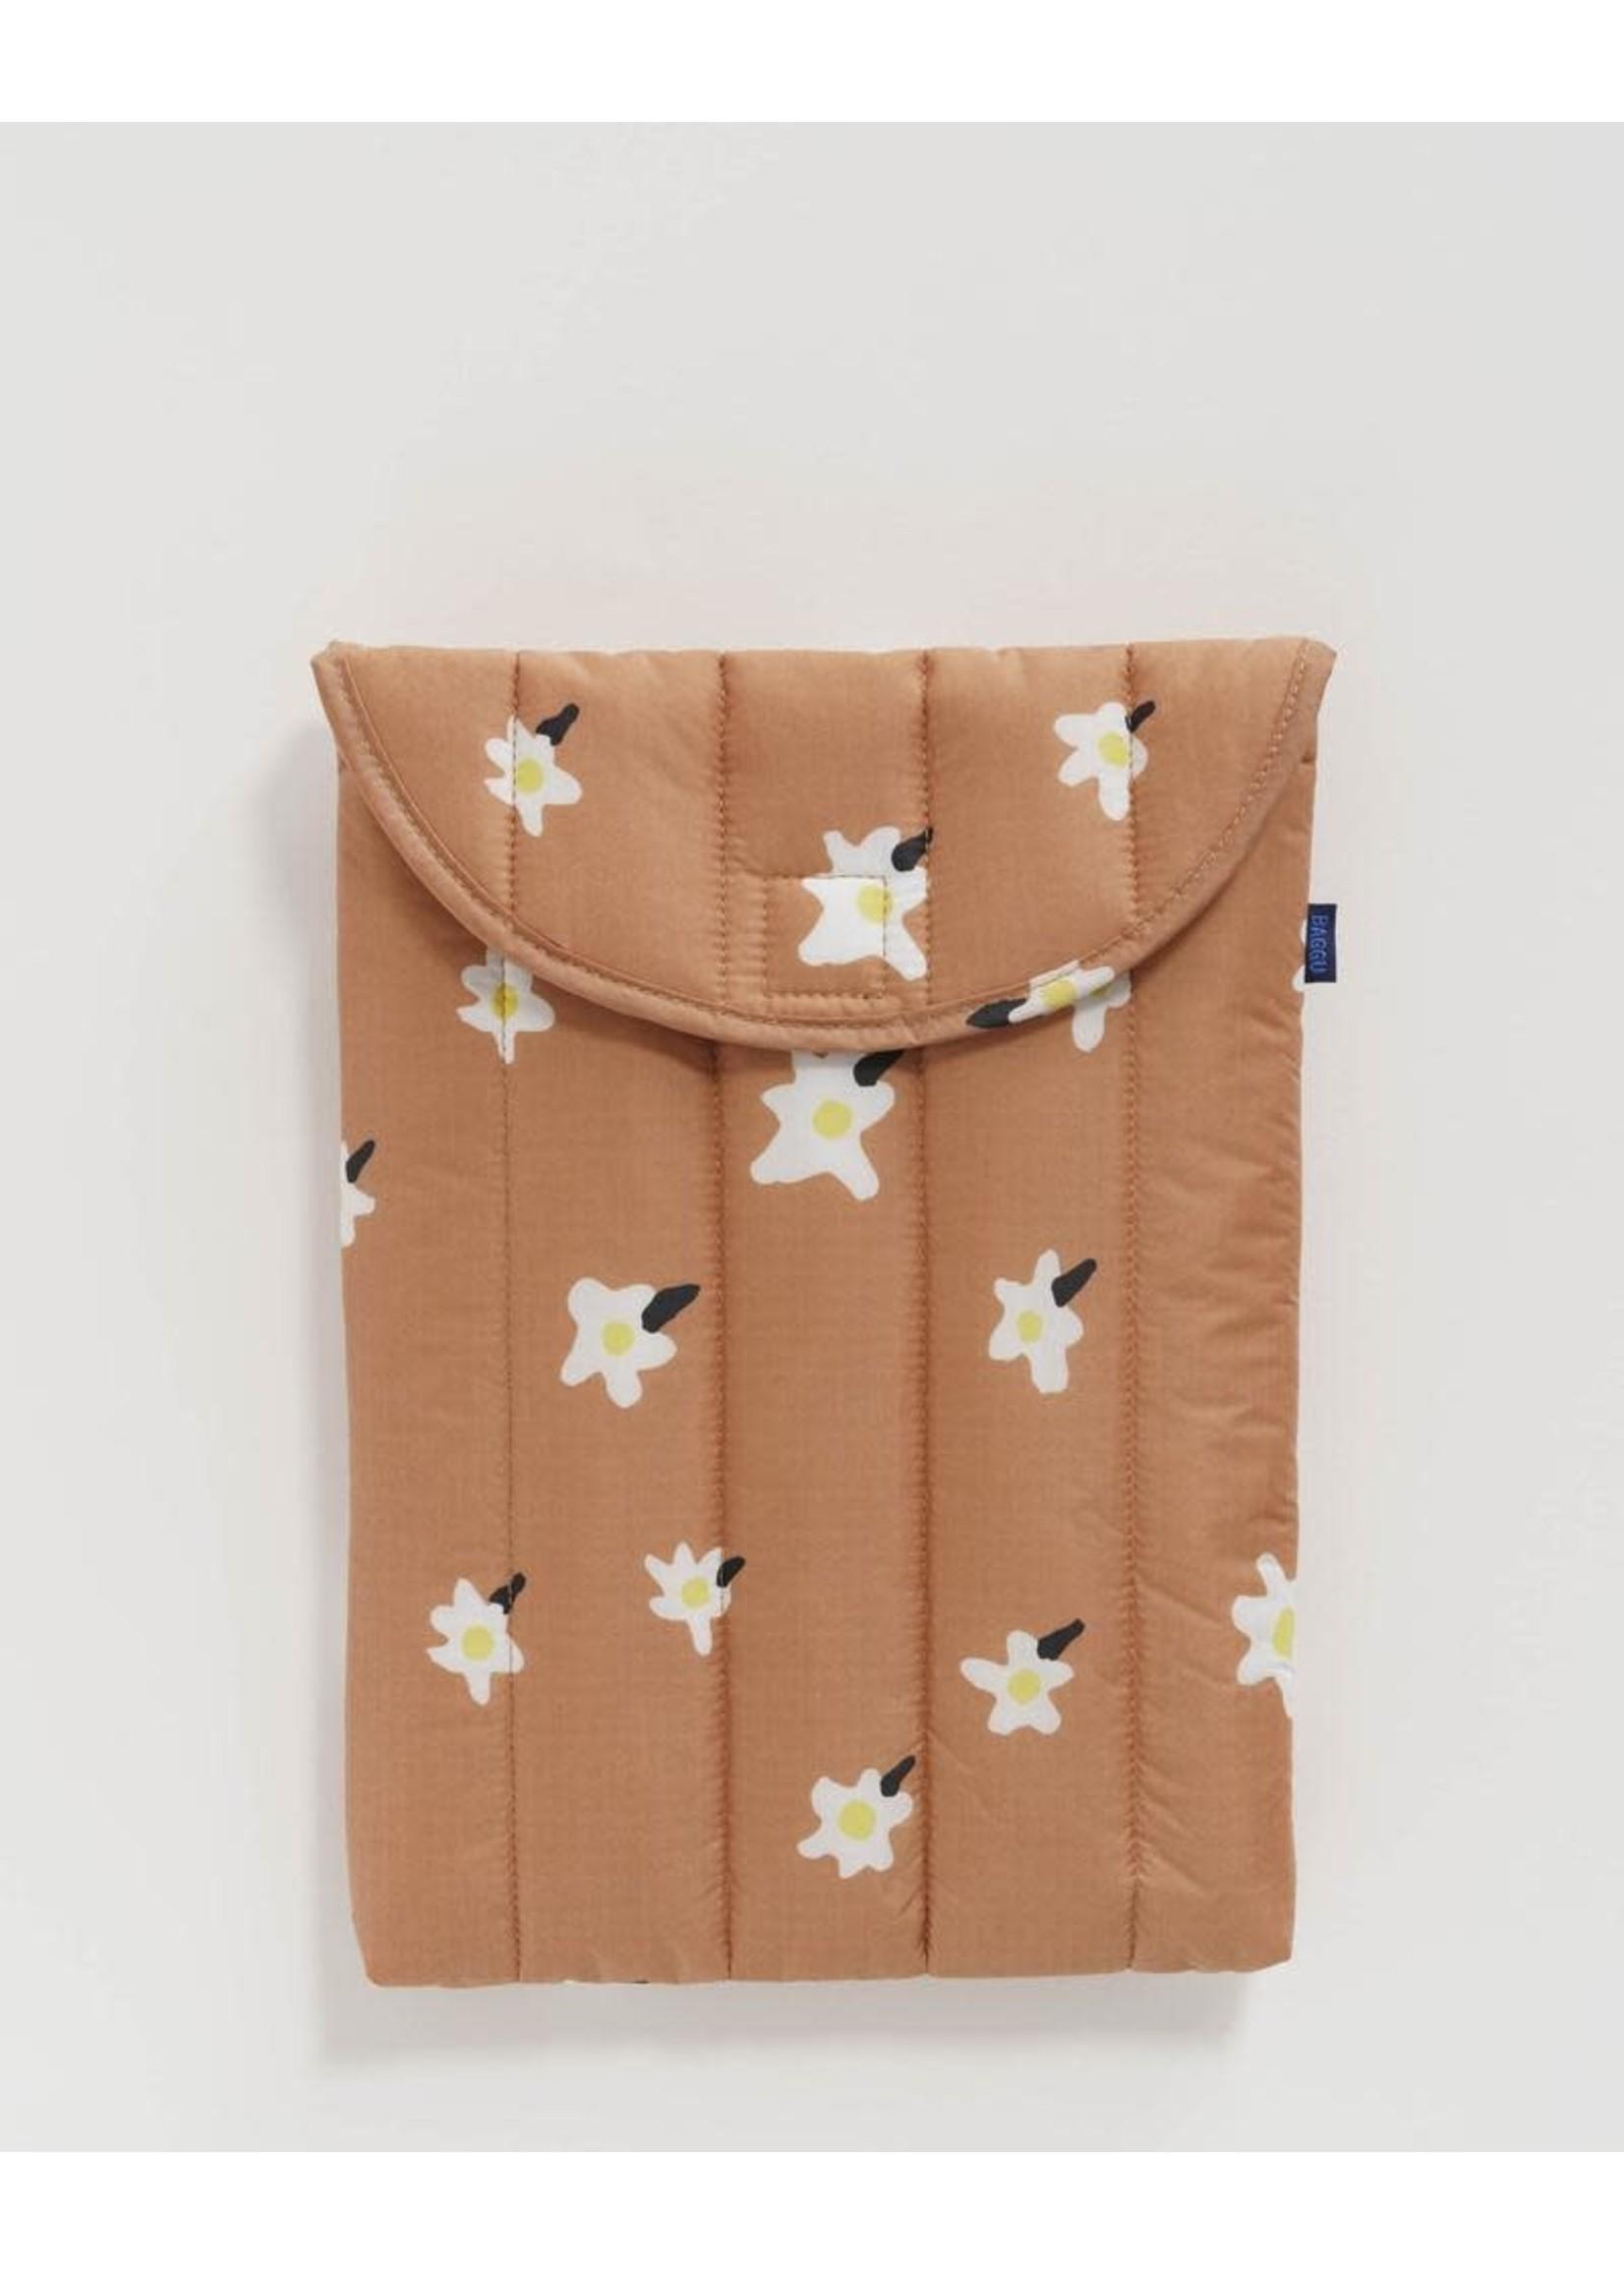 "Baggu Baggu Puffy Laptop Sleeve 13"" - Painted Daisy"